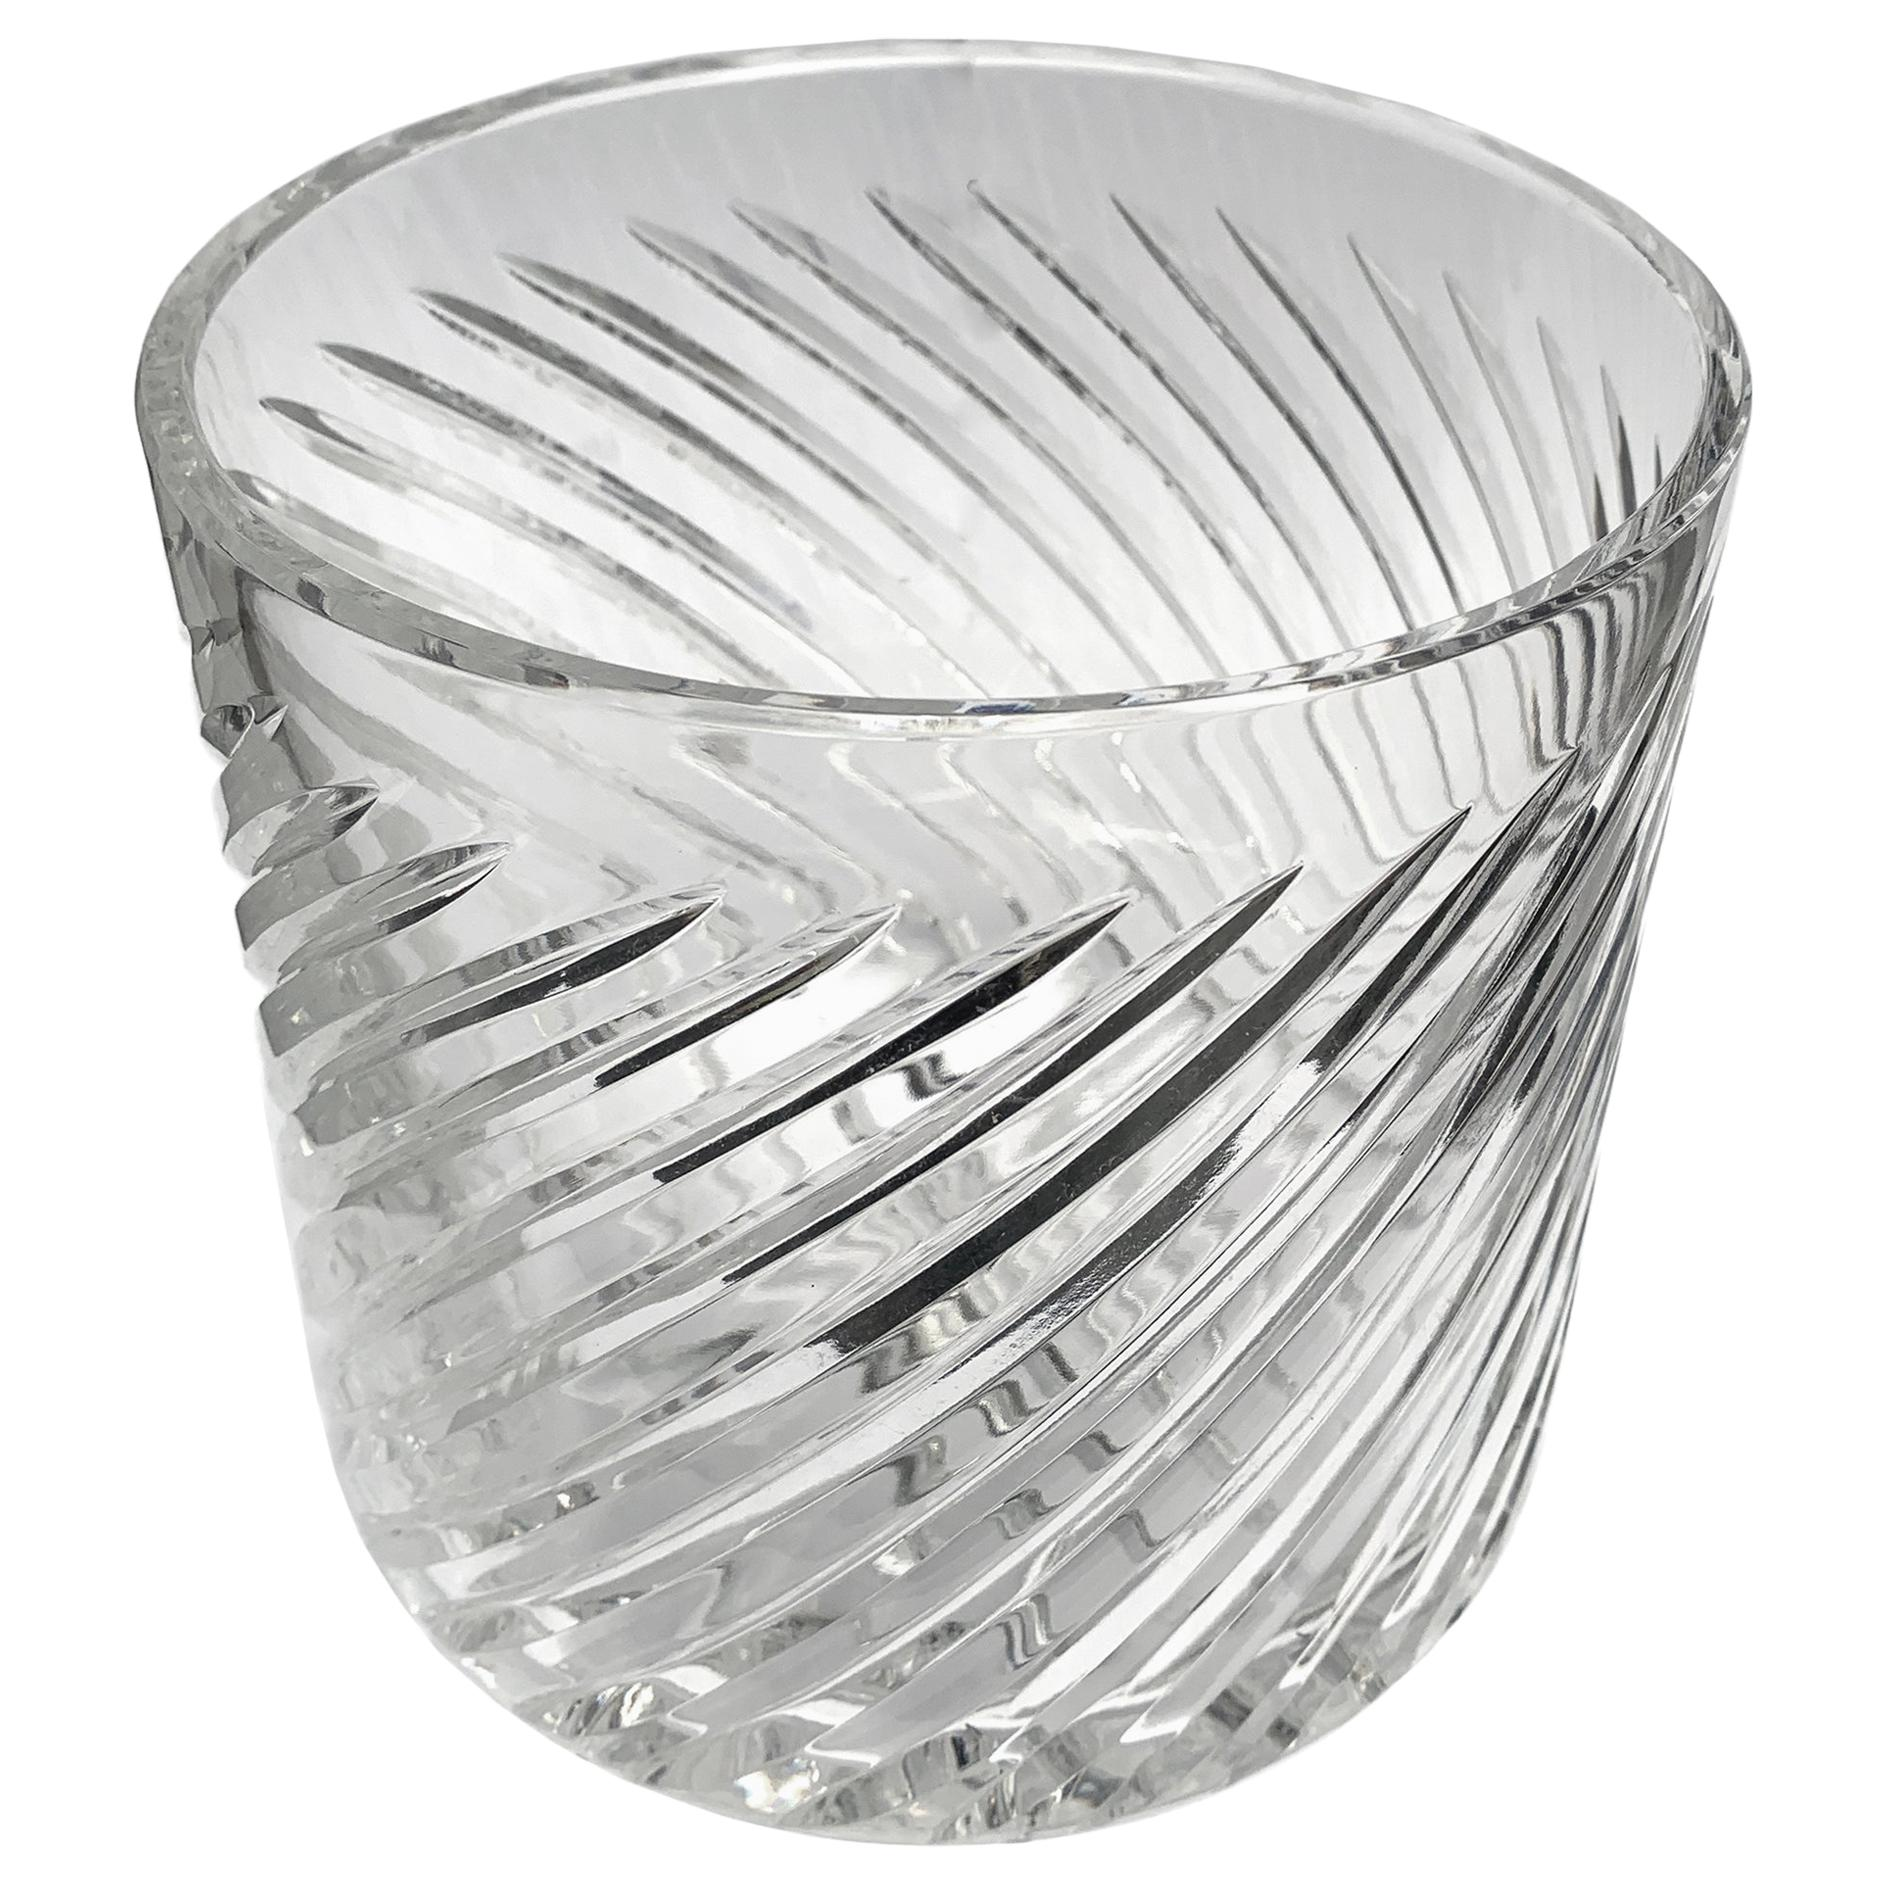 Vintage English Crystal Ice Bucket